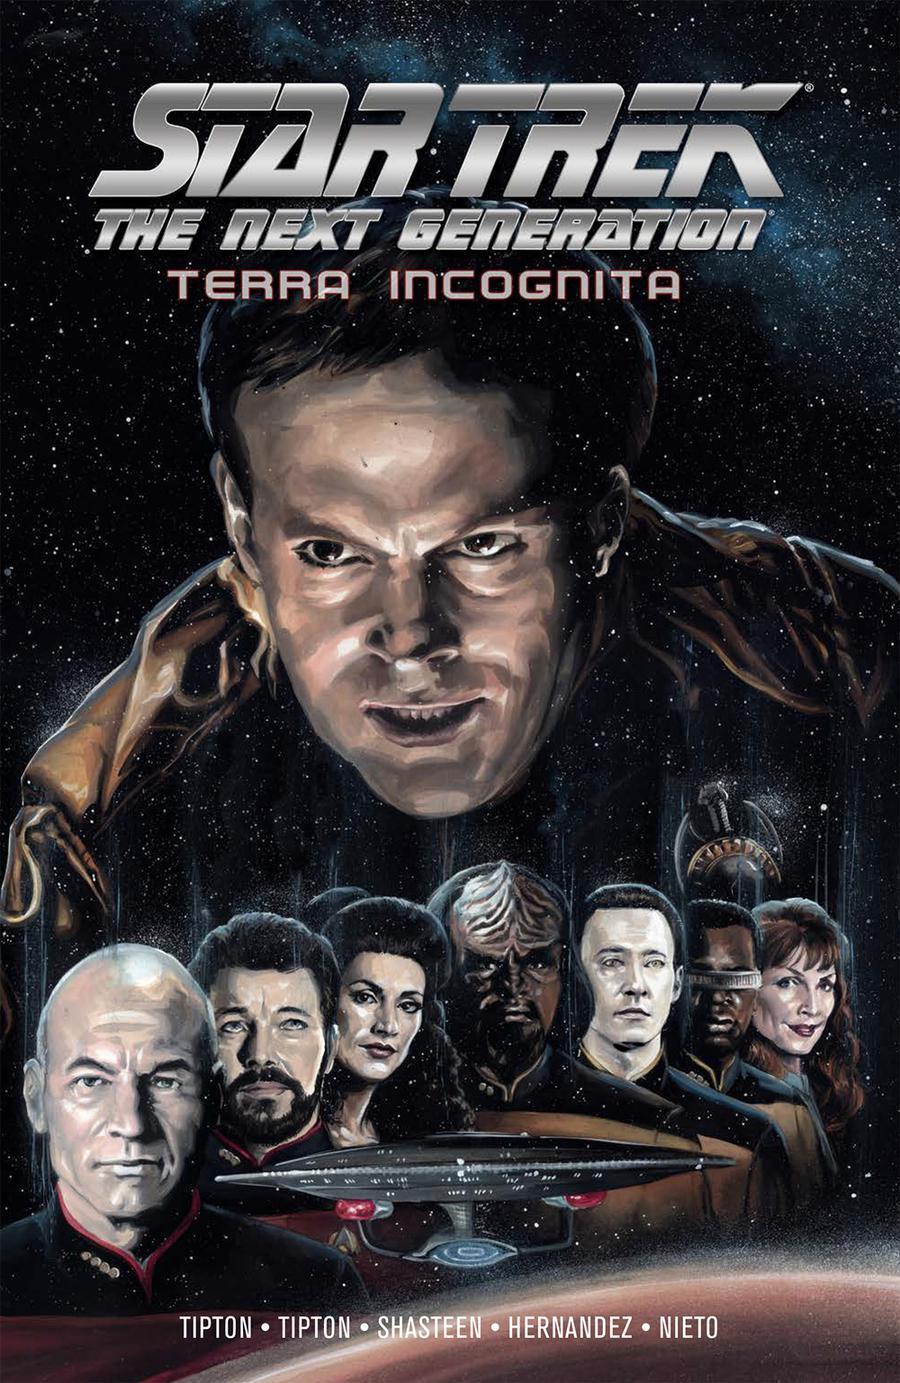 Star Trek The Next Generation Terra Incognita TP